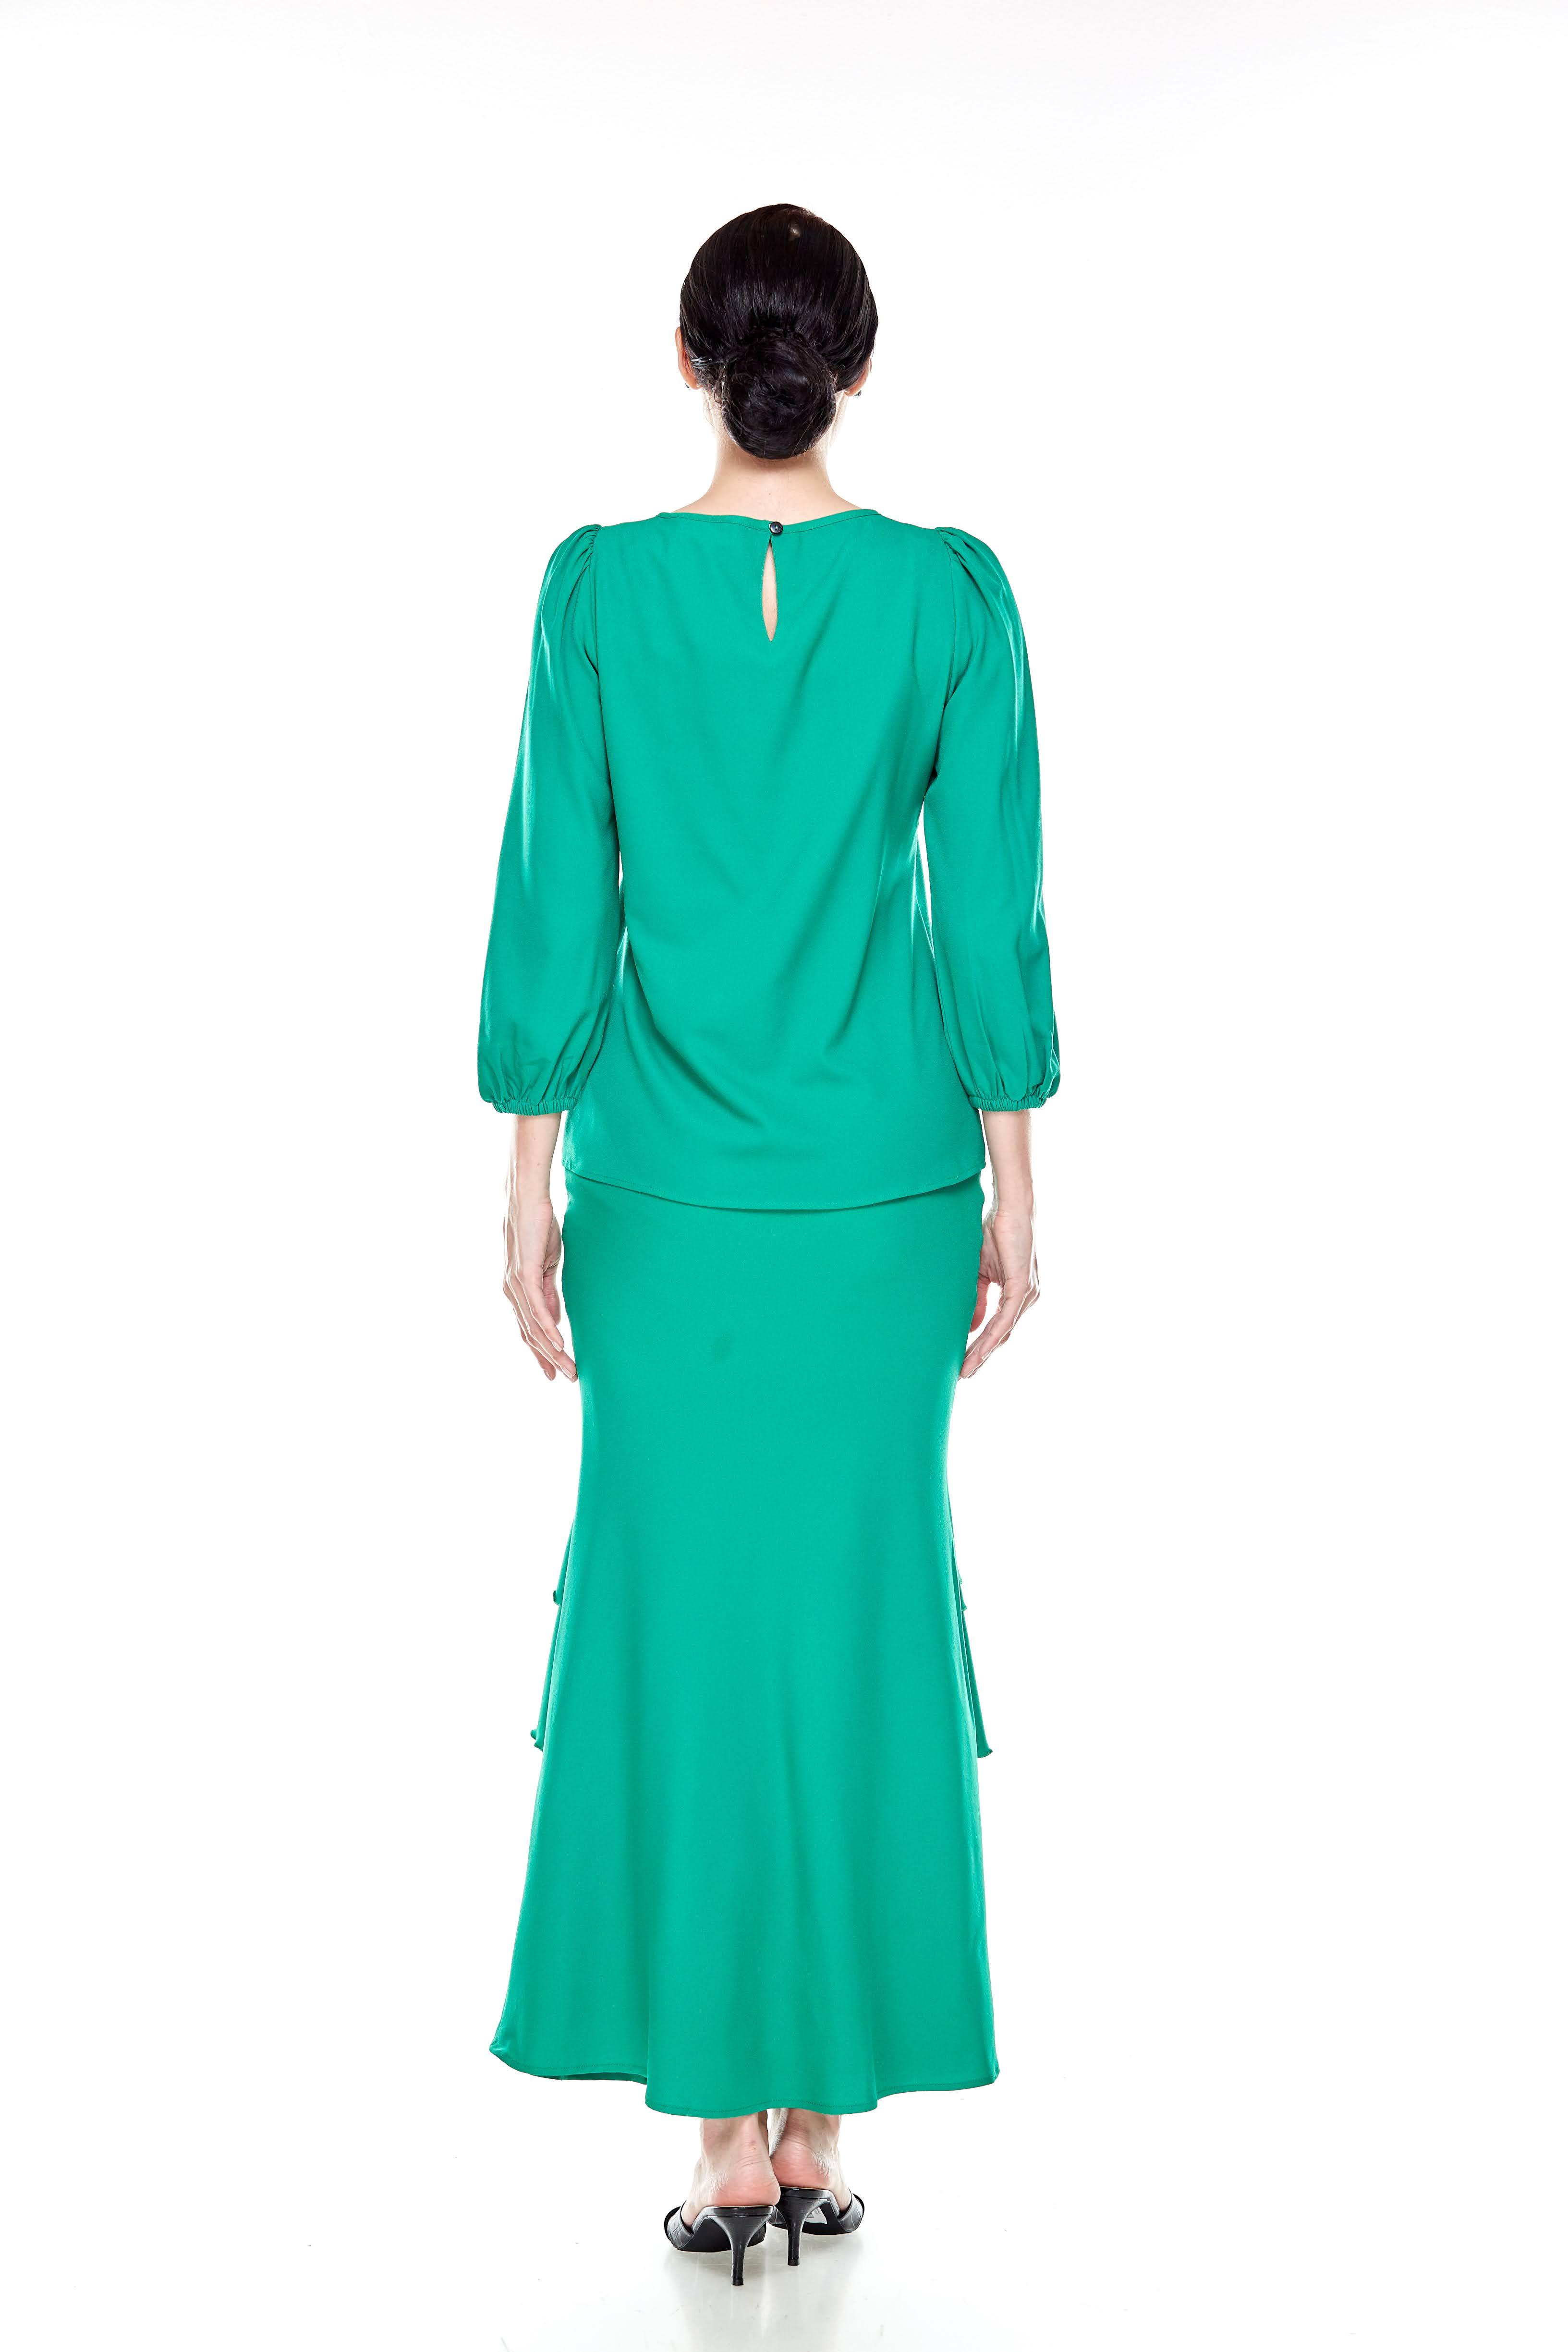 Shocking Green Puff Sleeve Blouse (7)